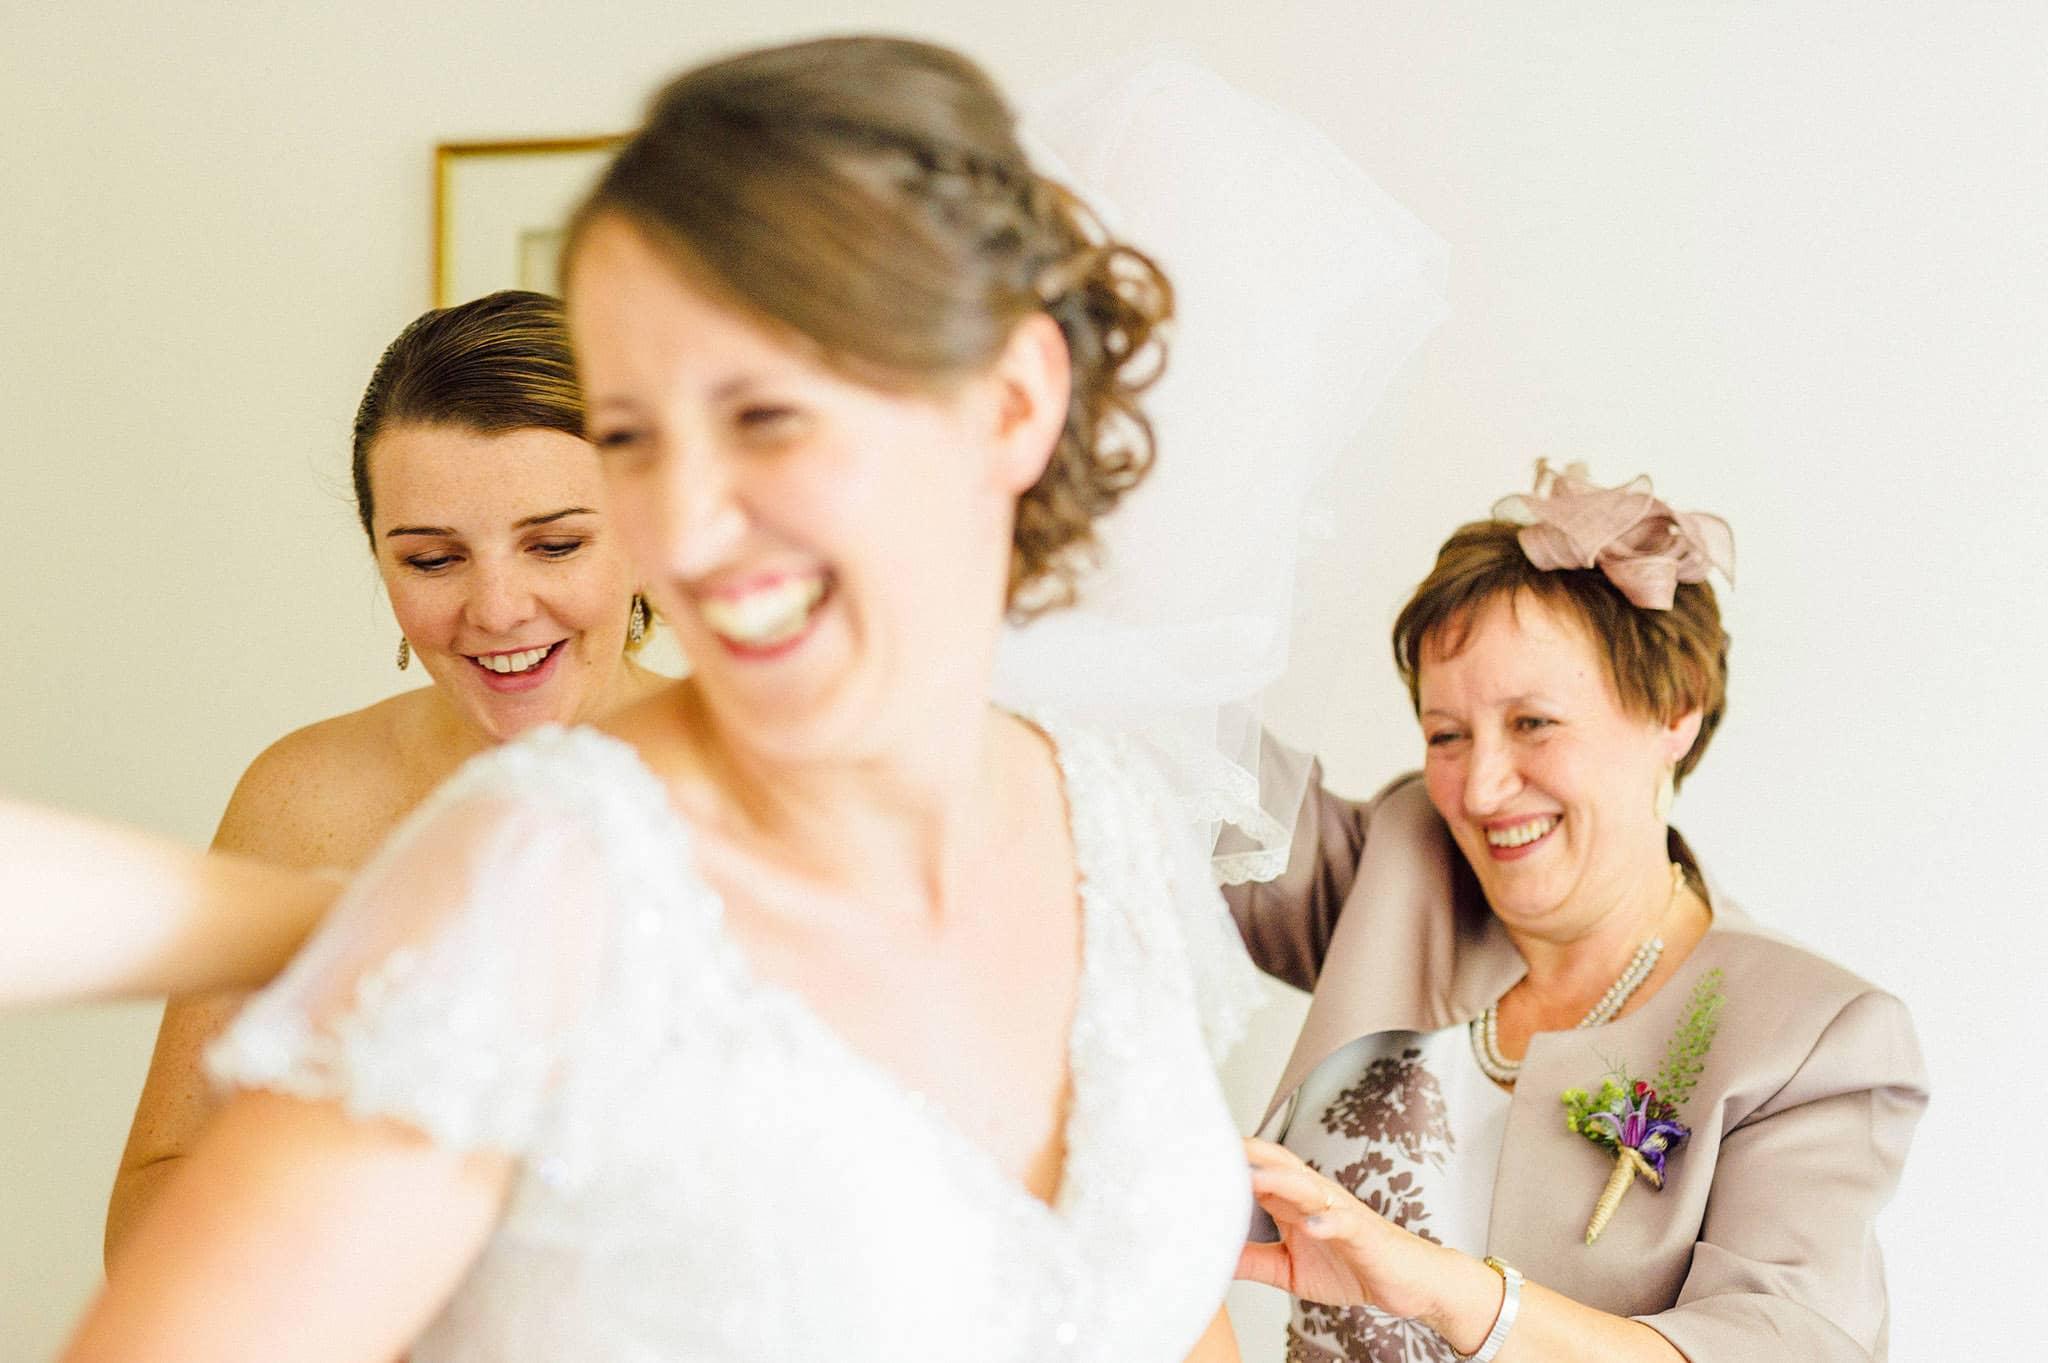 wedding-photographer-aberystwyth-wales (18)